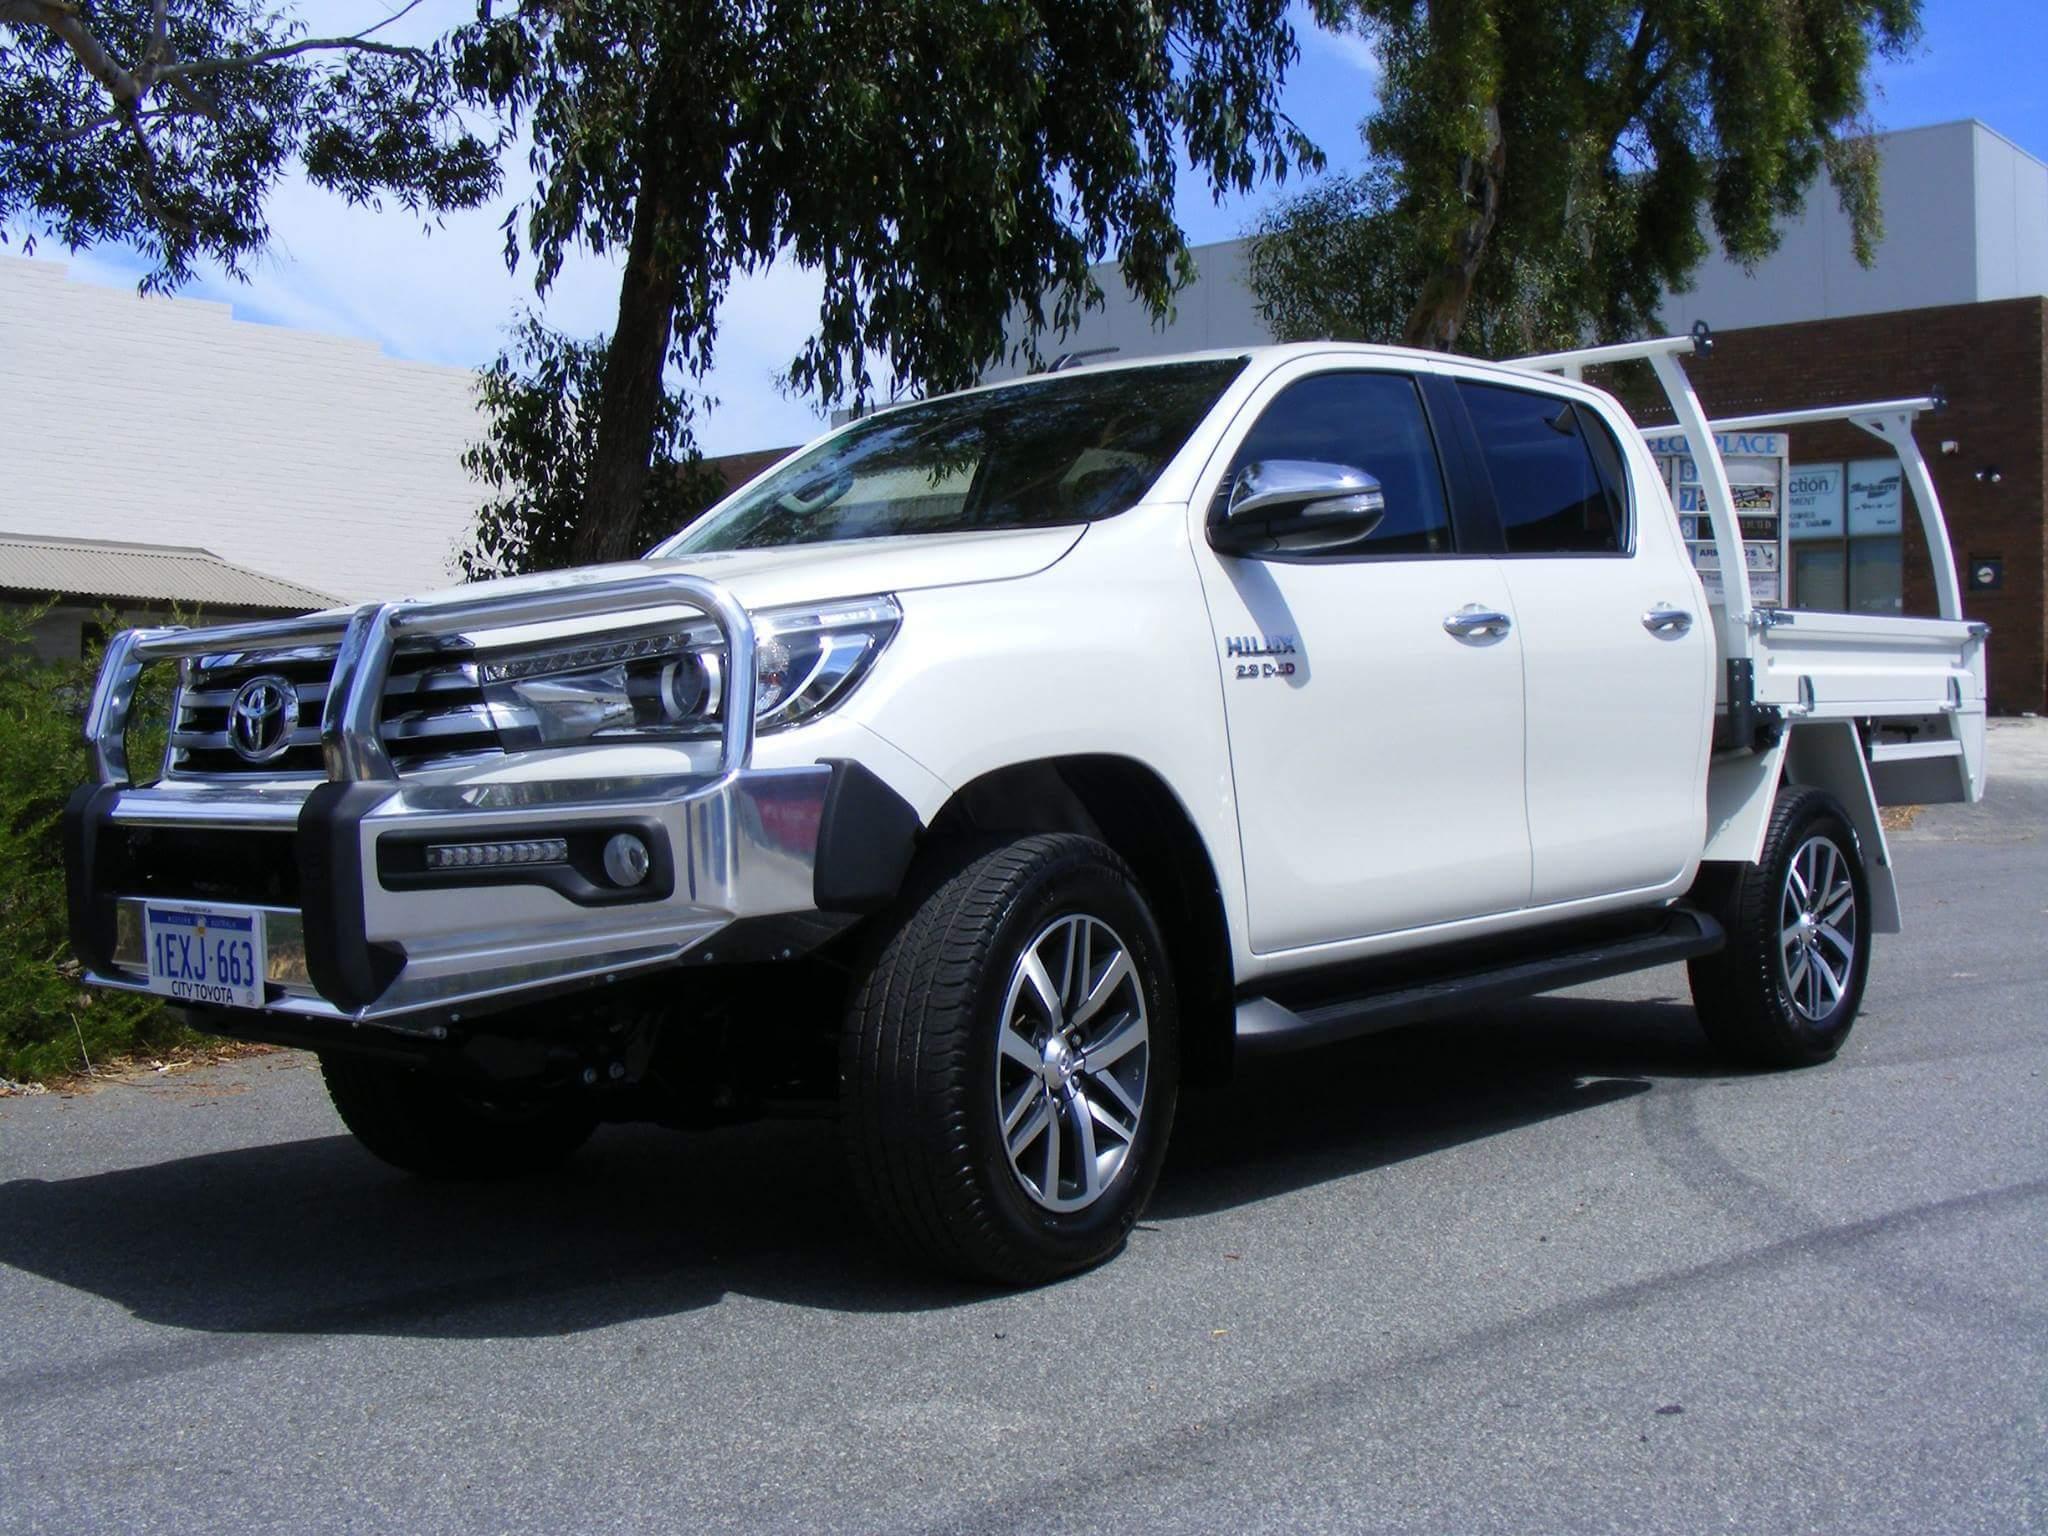 Toyota Hilux Dual Cab Flat Tray & New SR5 Toyota Hilux | Bull Motor Bodies